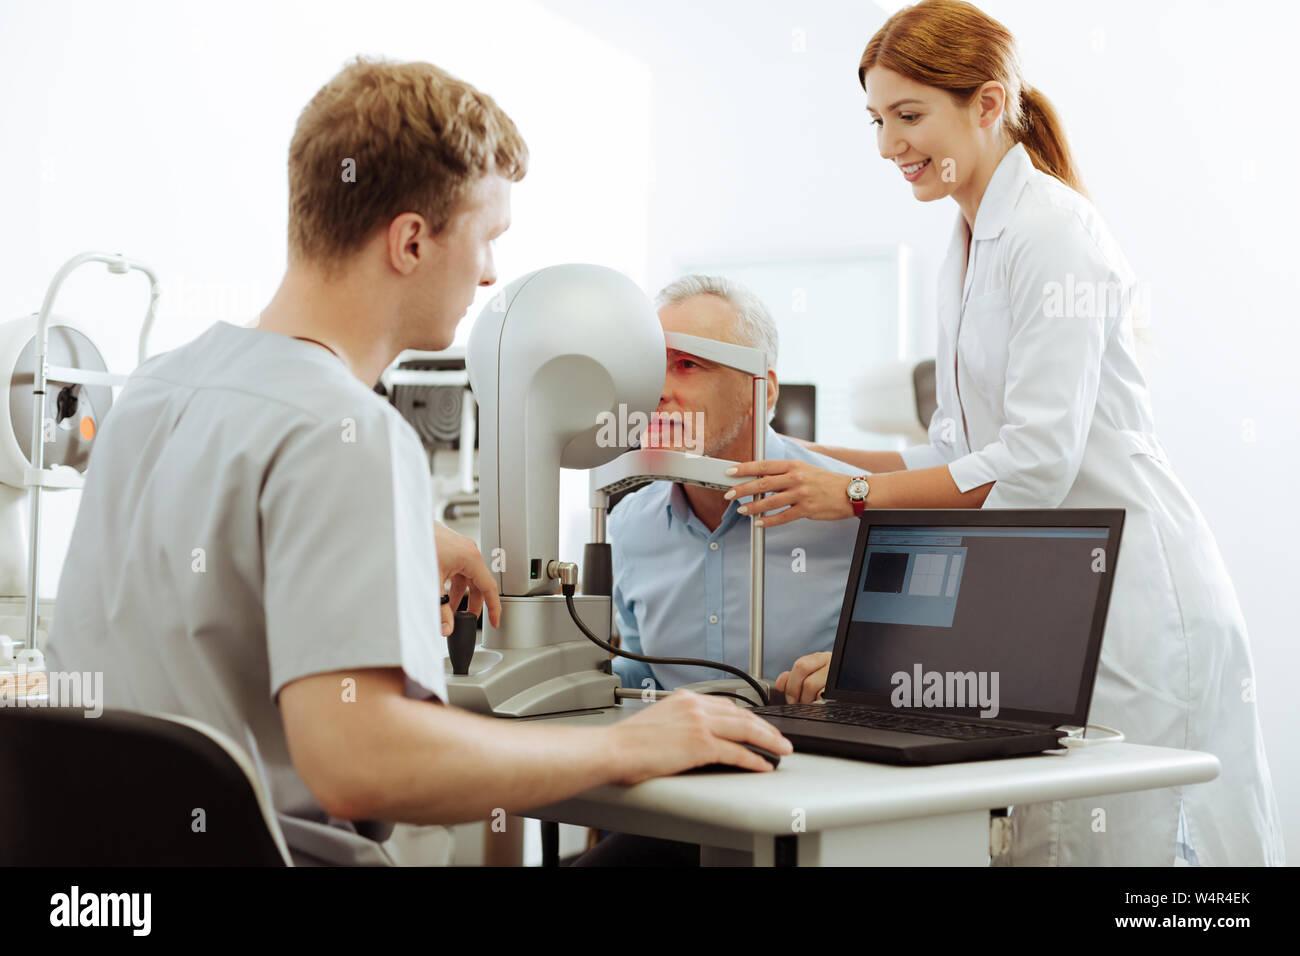 Nurse Assisting Patient Pleasant Helpful Nurse Assisting Patient Visiting Eye Specialist In Private Clinic Stock Photo Alamy